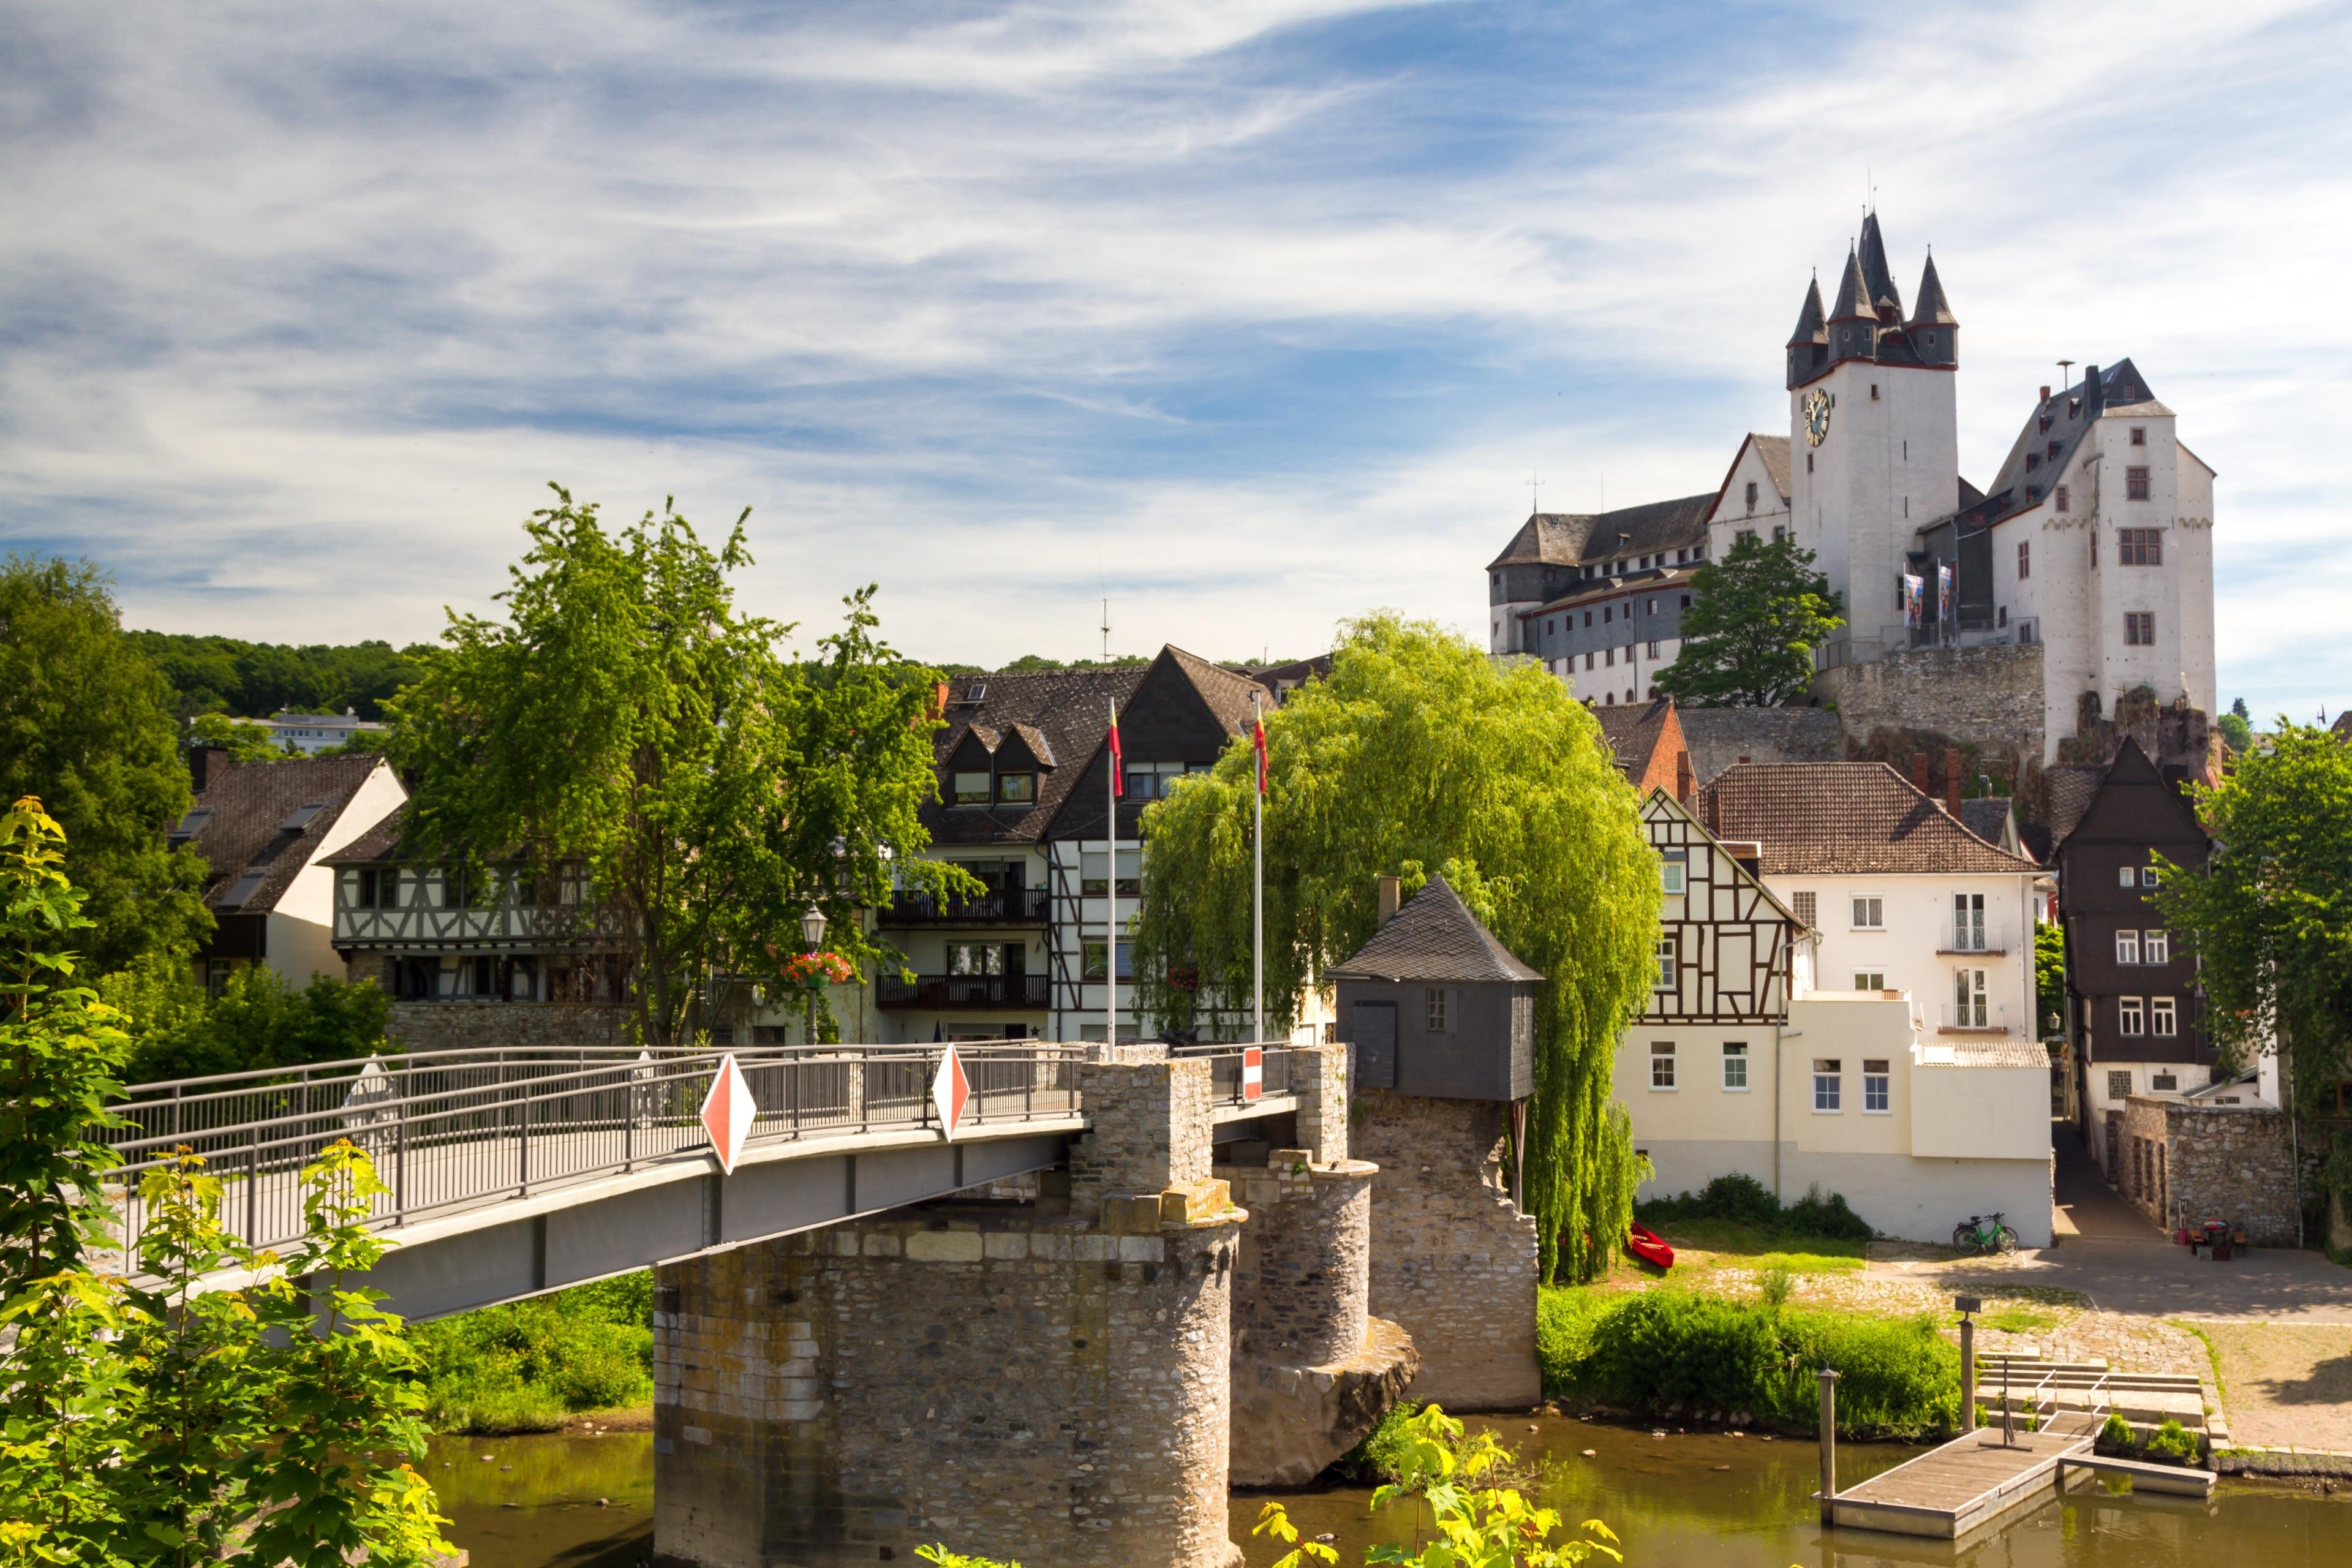 Diez, Rhineland-Palatinate, Germany